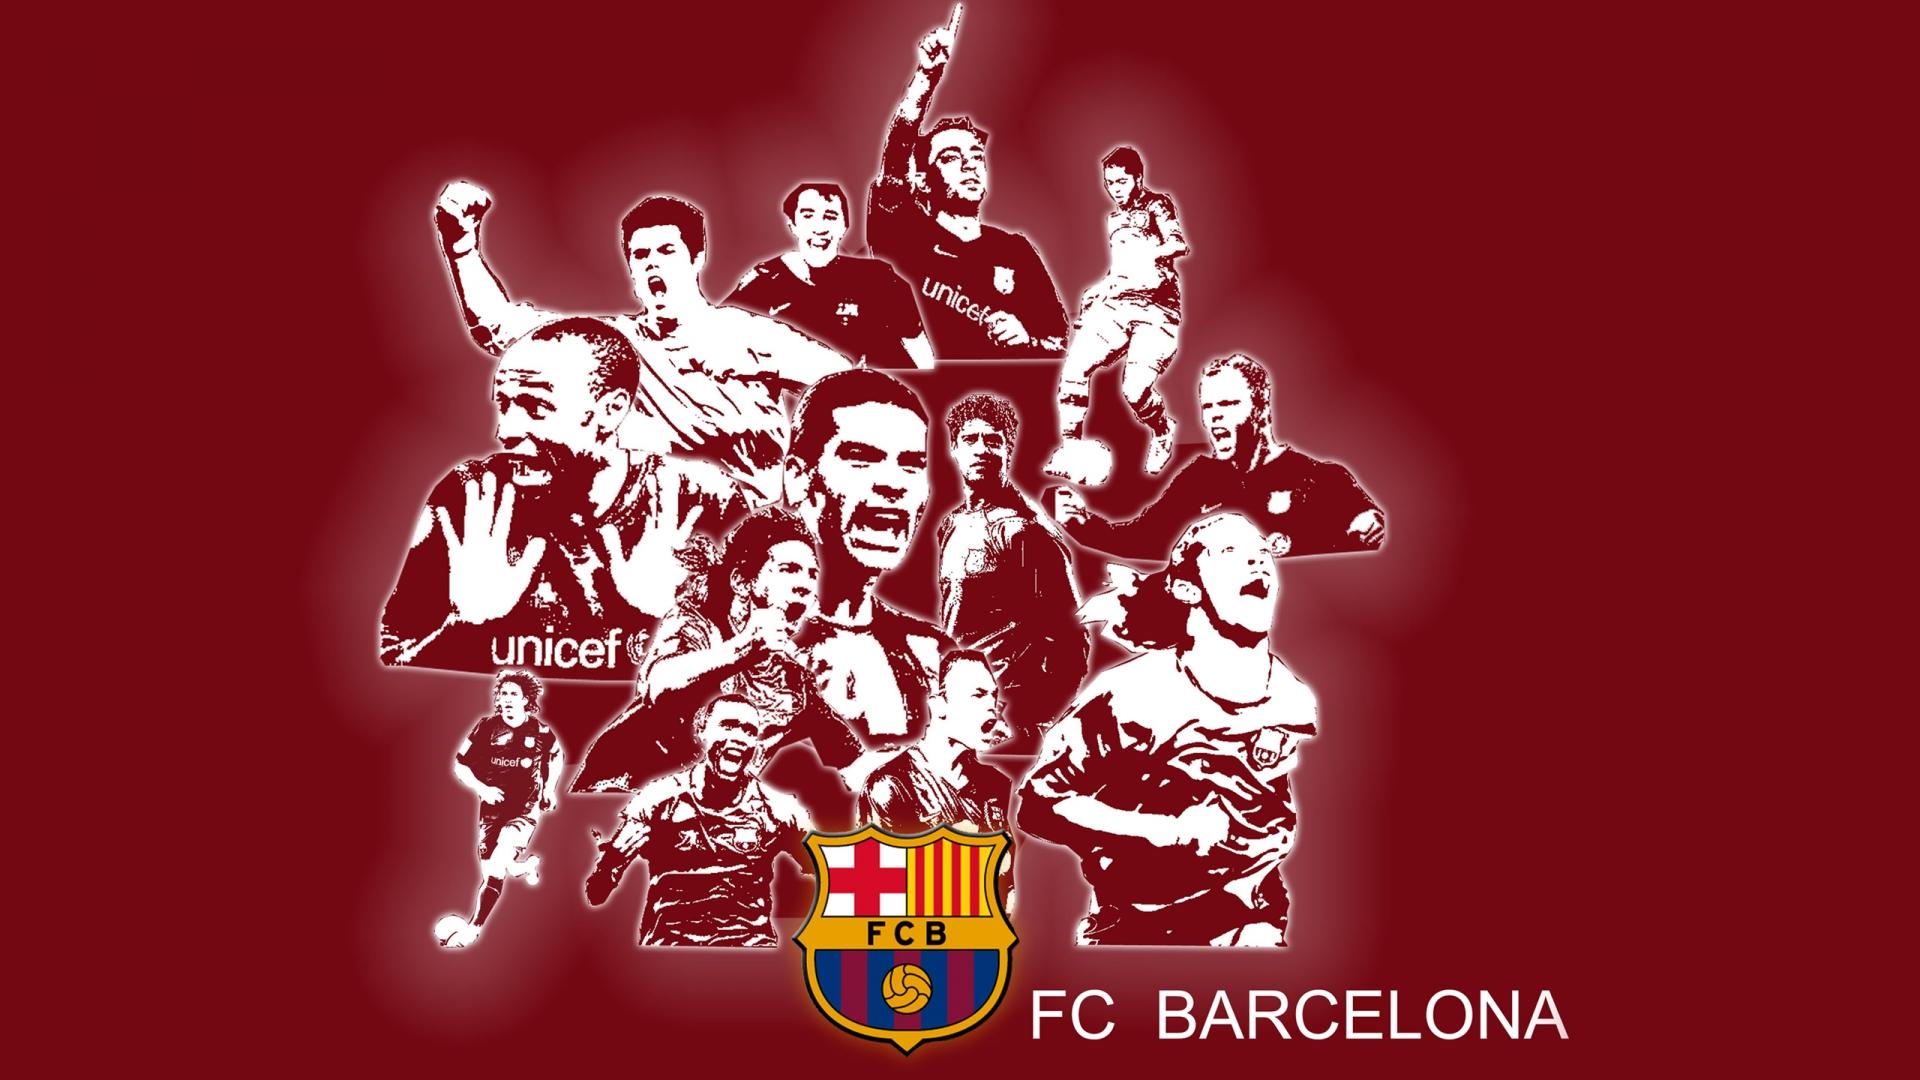 fc barcelona desktop wallpaper - photo #26